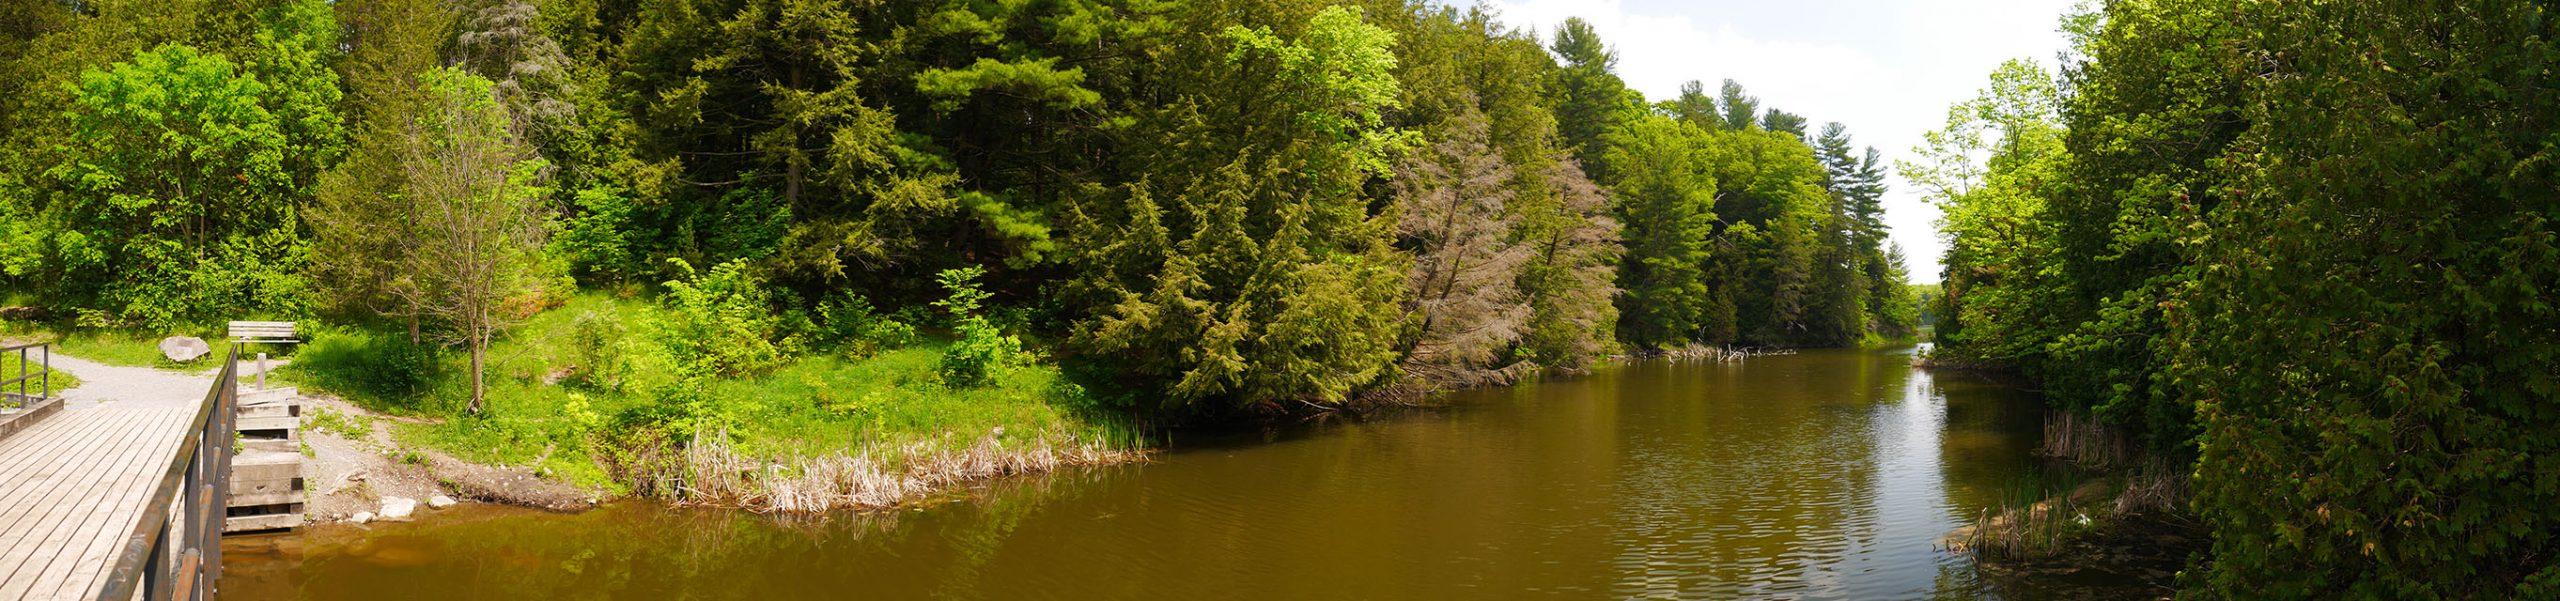 Bridge over the stream at Parrott's Bay